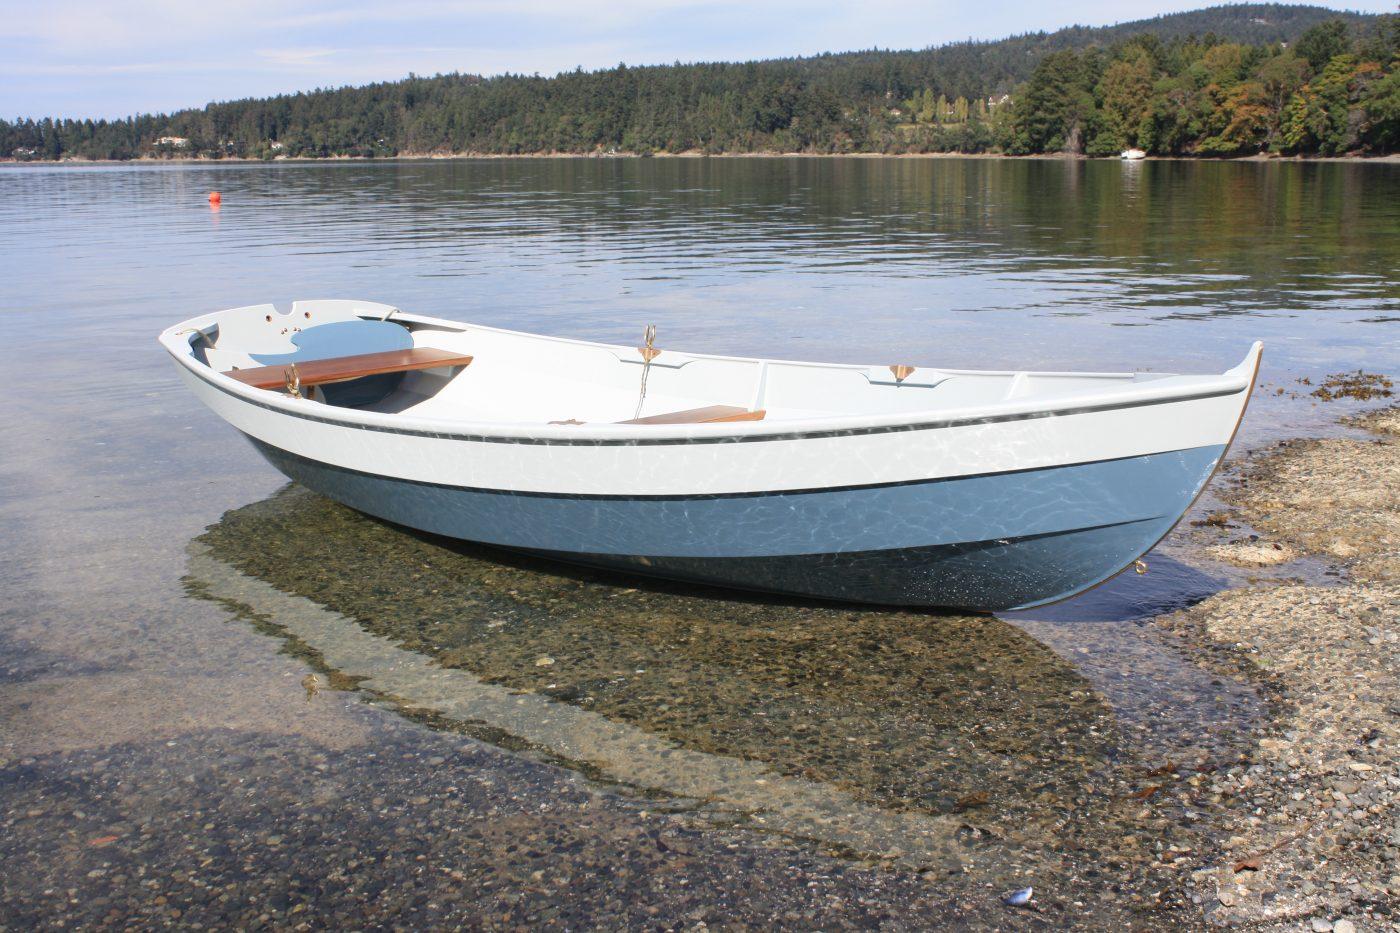 Joel White designed Shellback dinghy